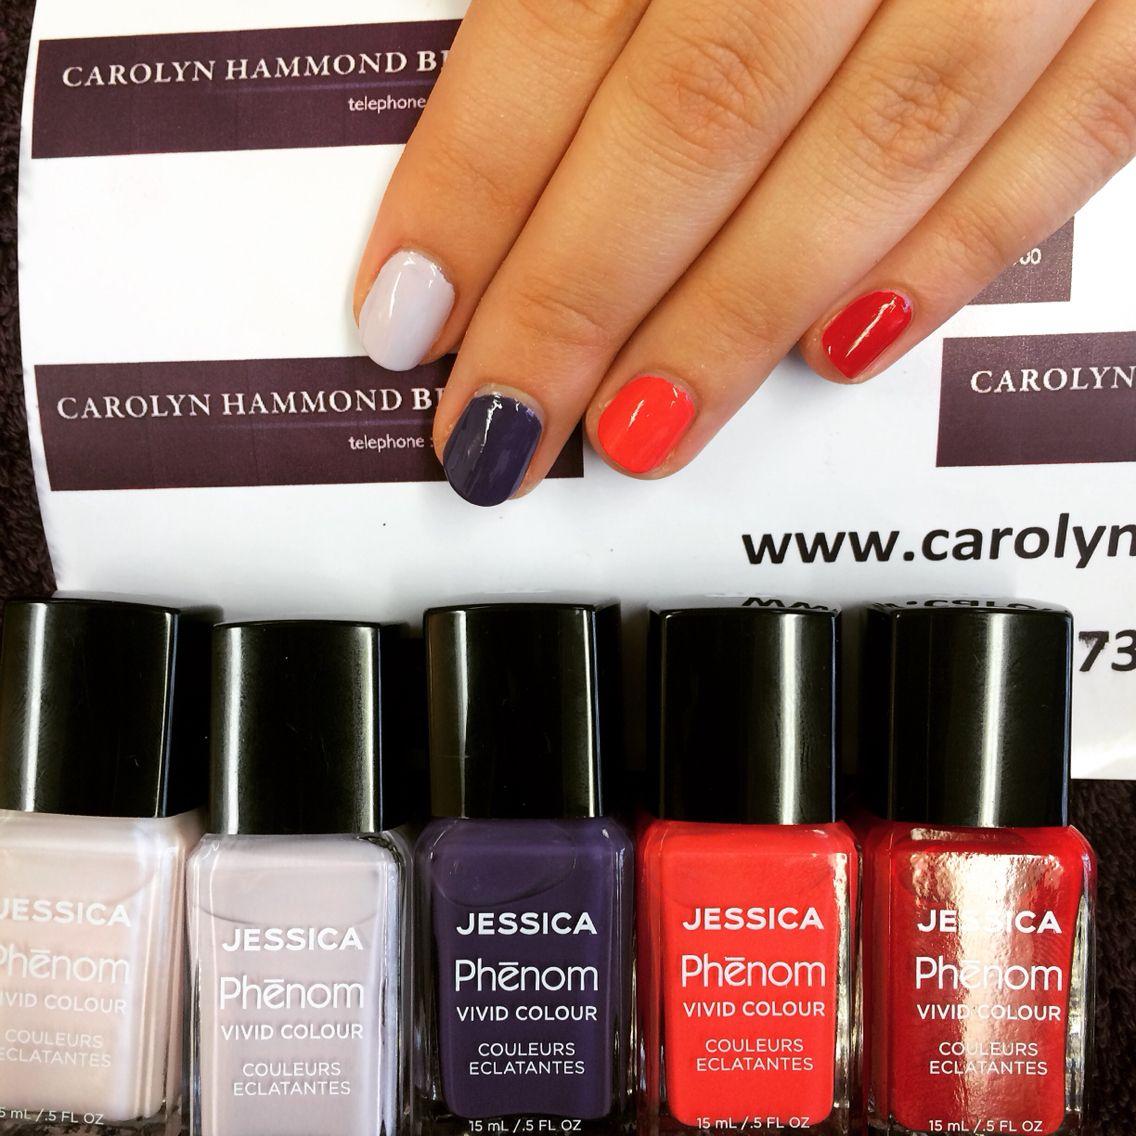 New Phenom Colours At The Salon Nail Polish Nails Polish